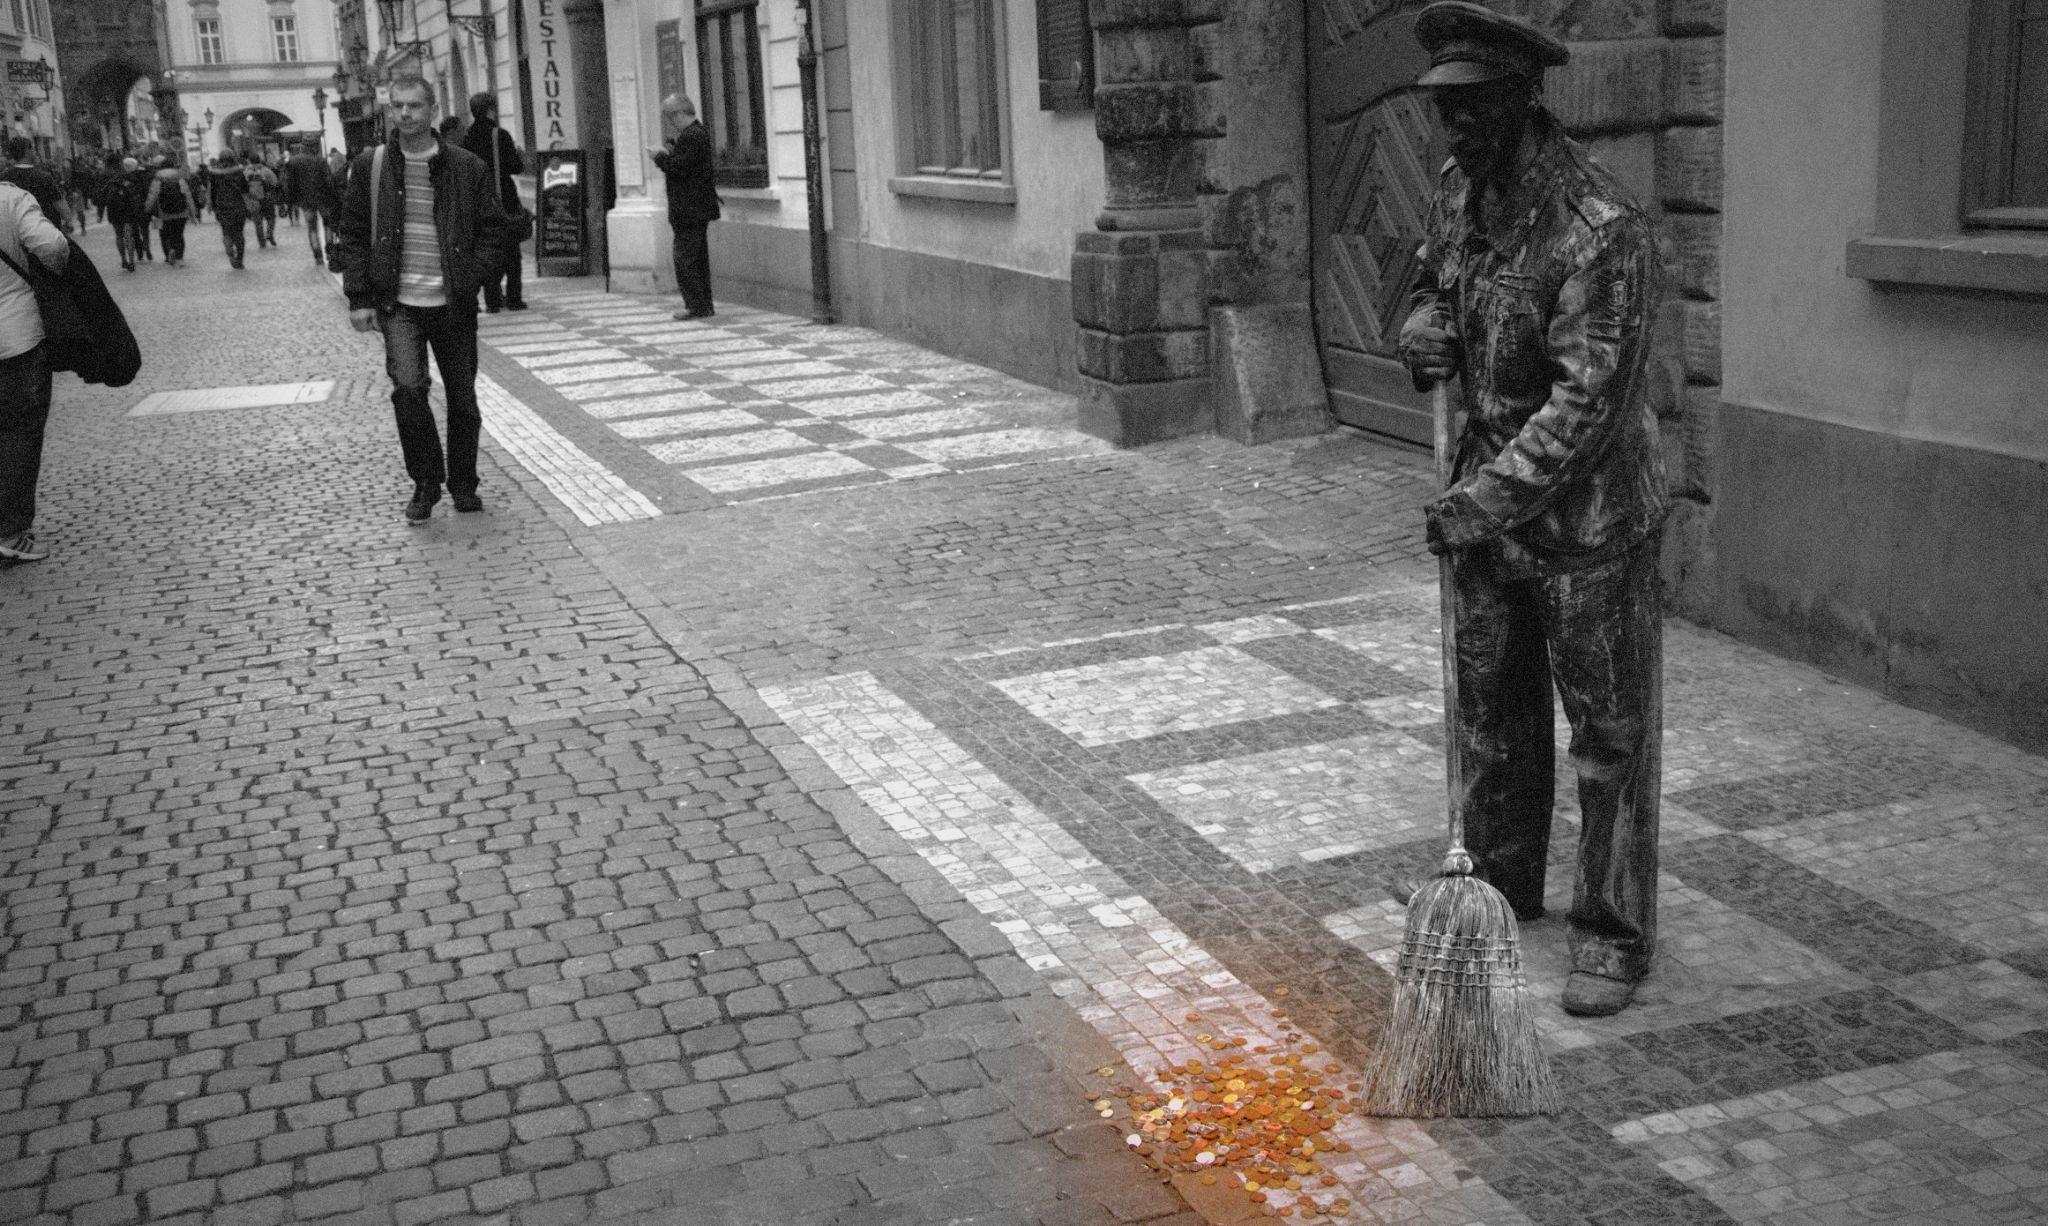 Prague street by rastislavk1